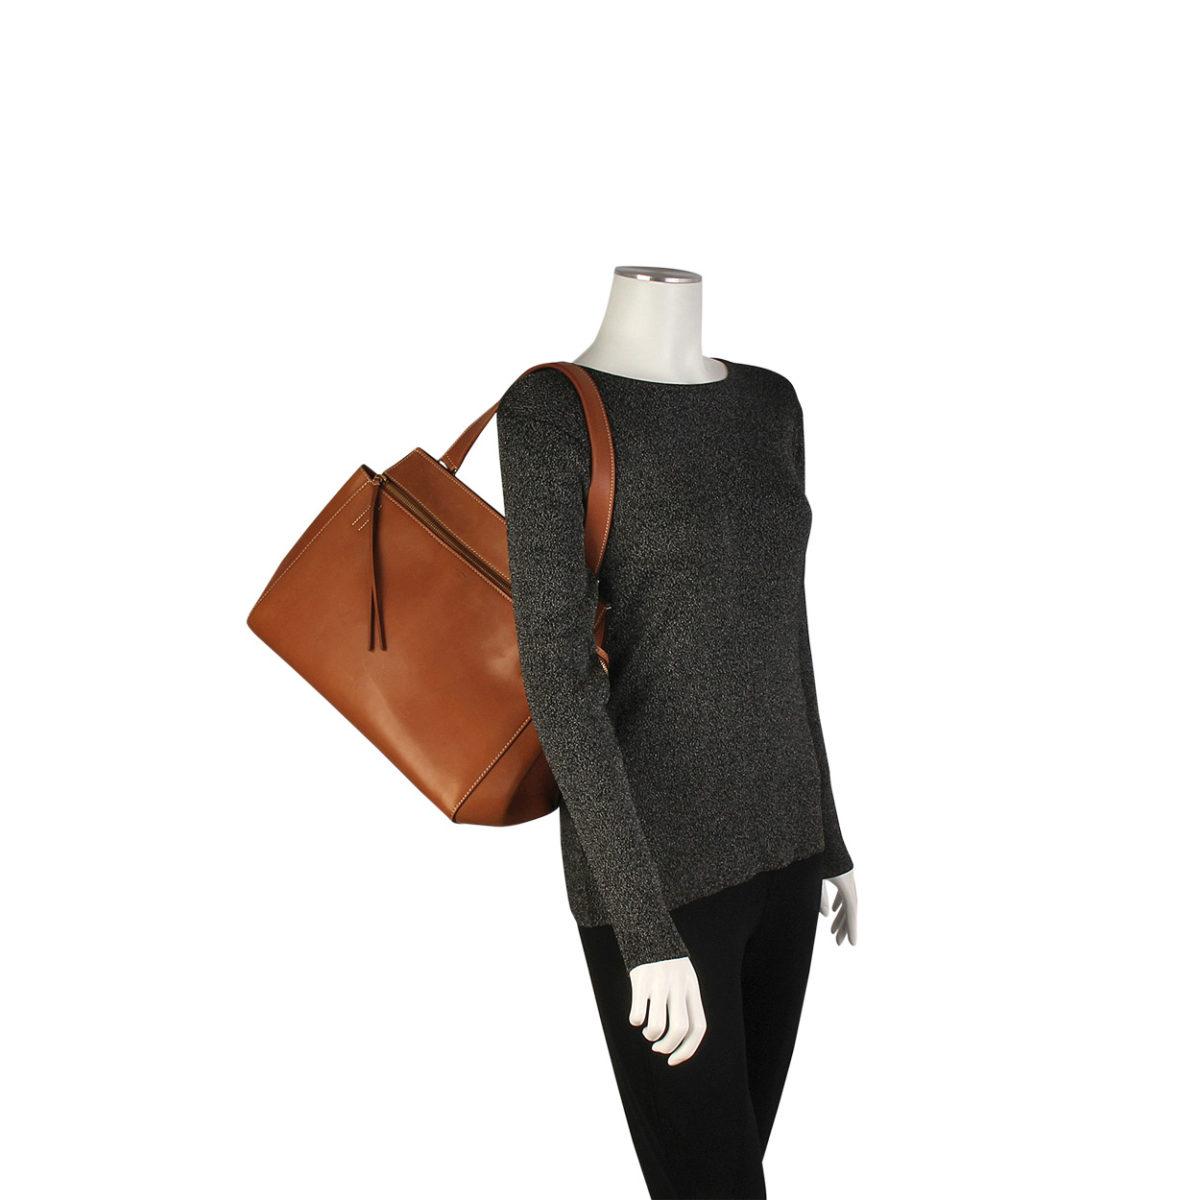 1baa48e41c4b CELINE Edge Leather Tote Brown